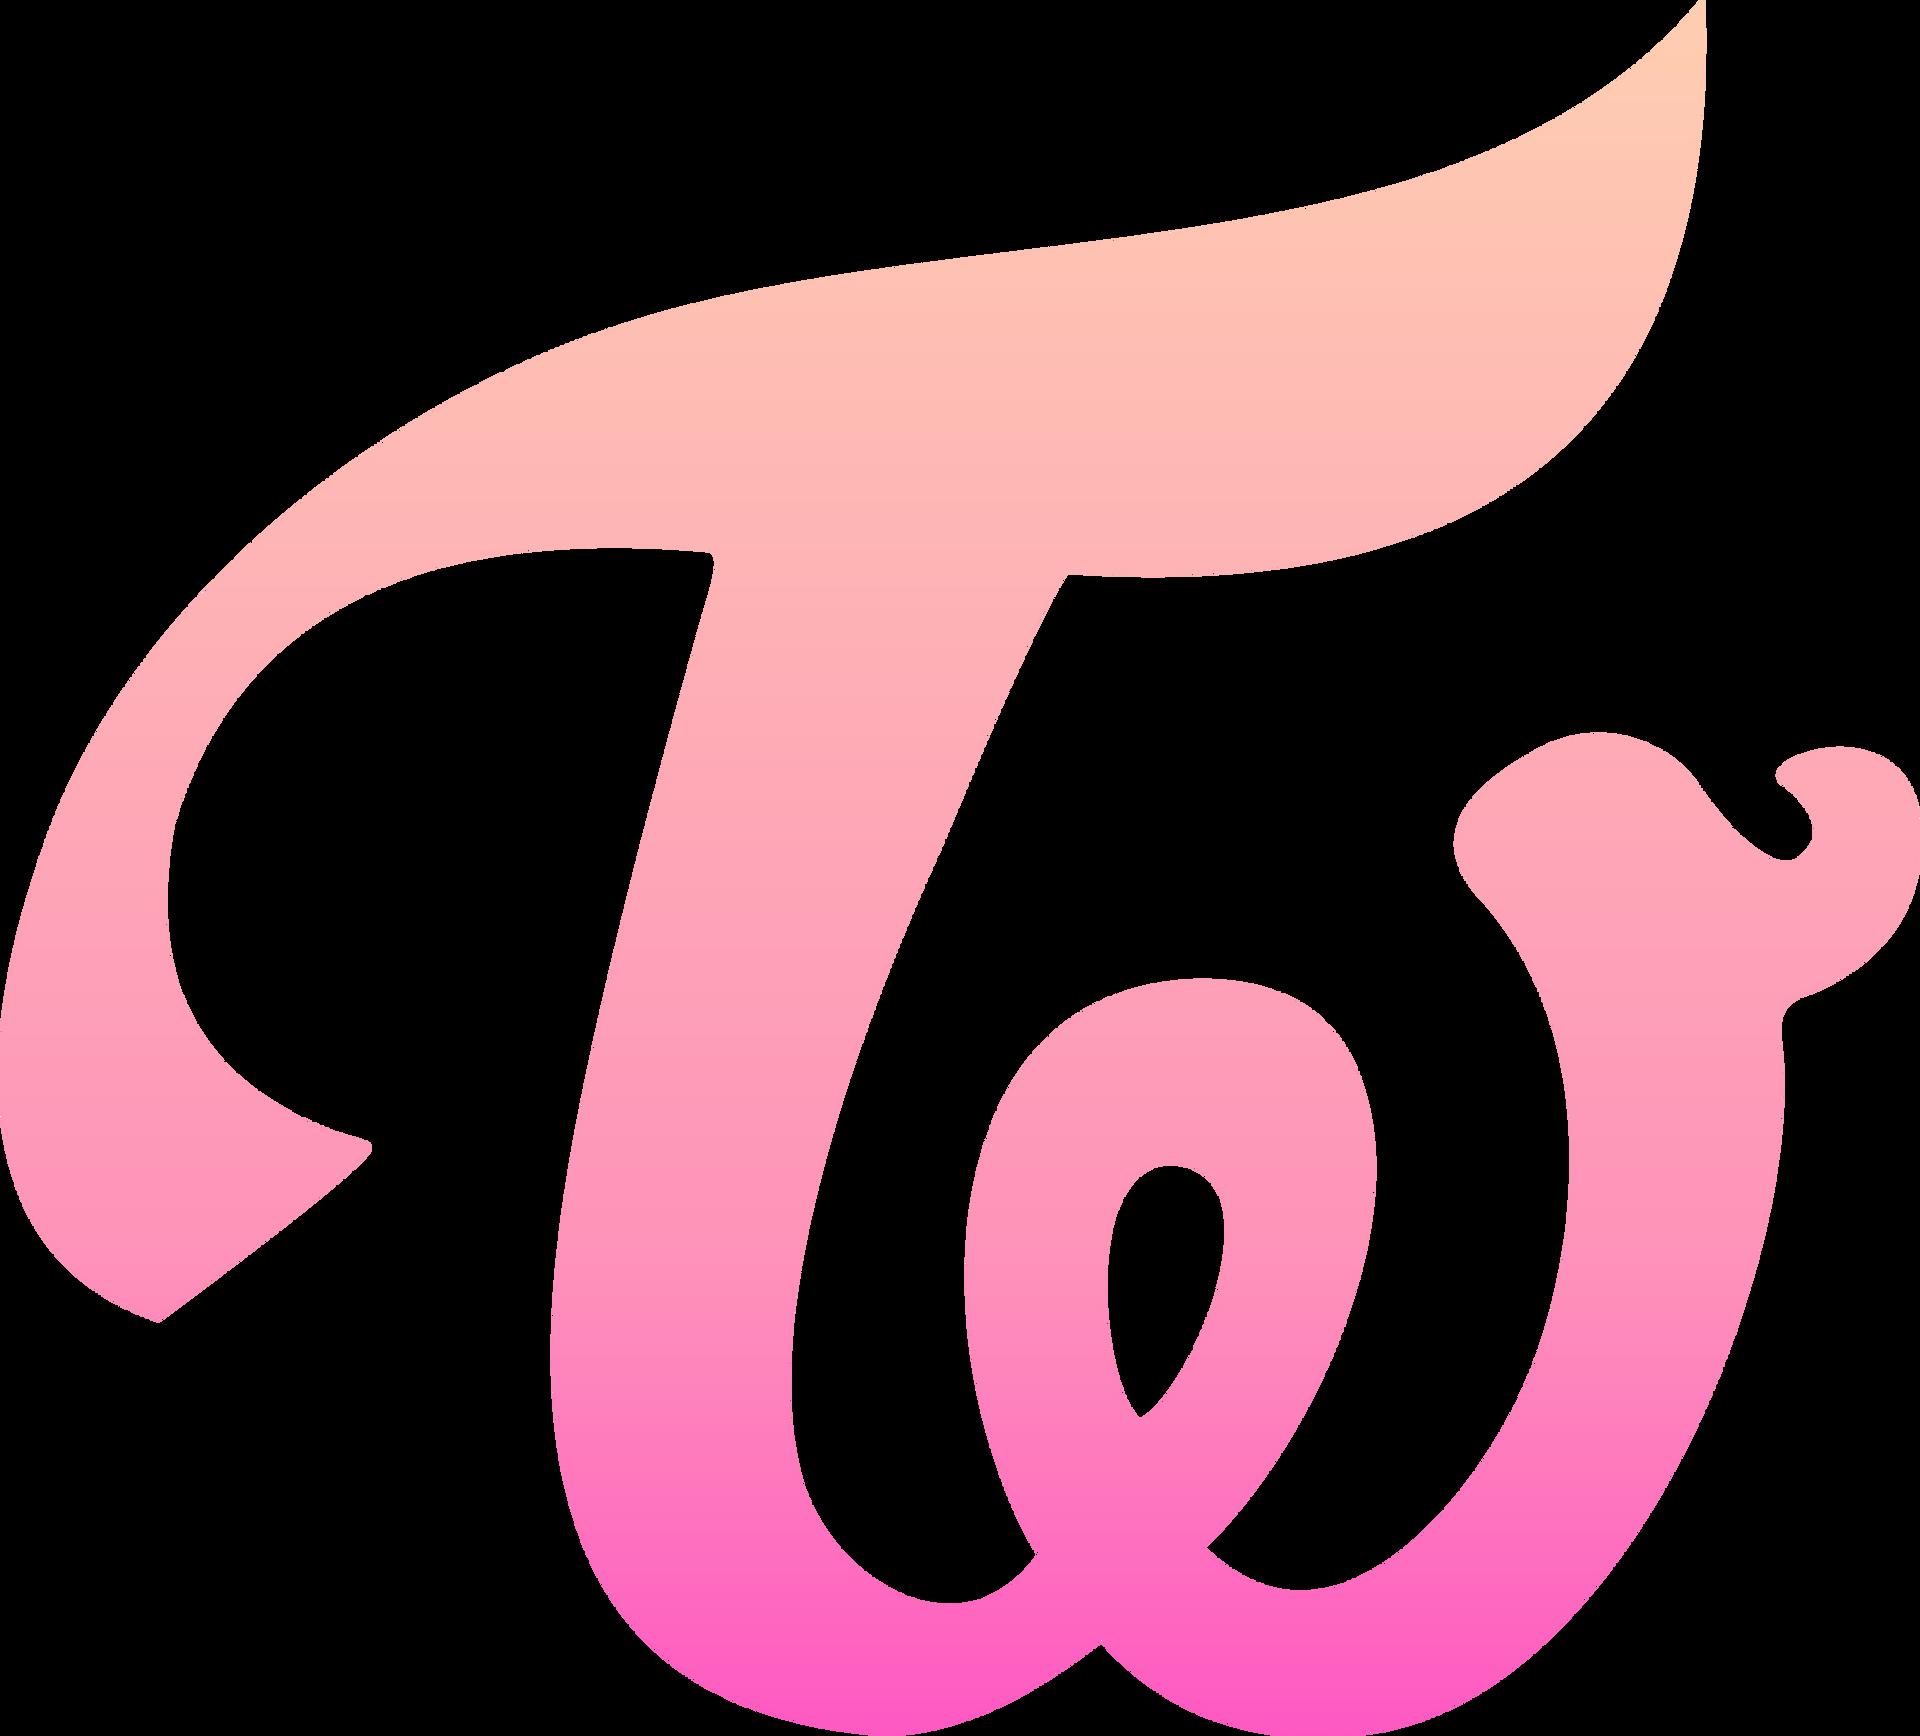 Twice Logo By Mimilevi On Deviantart From wikimedia commons, the free media repository. twice logo by mimilevi on deviantart